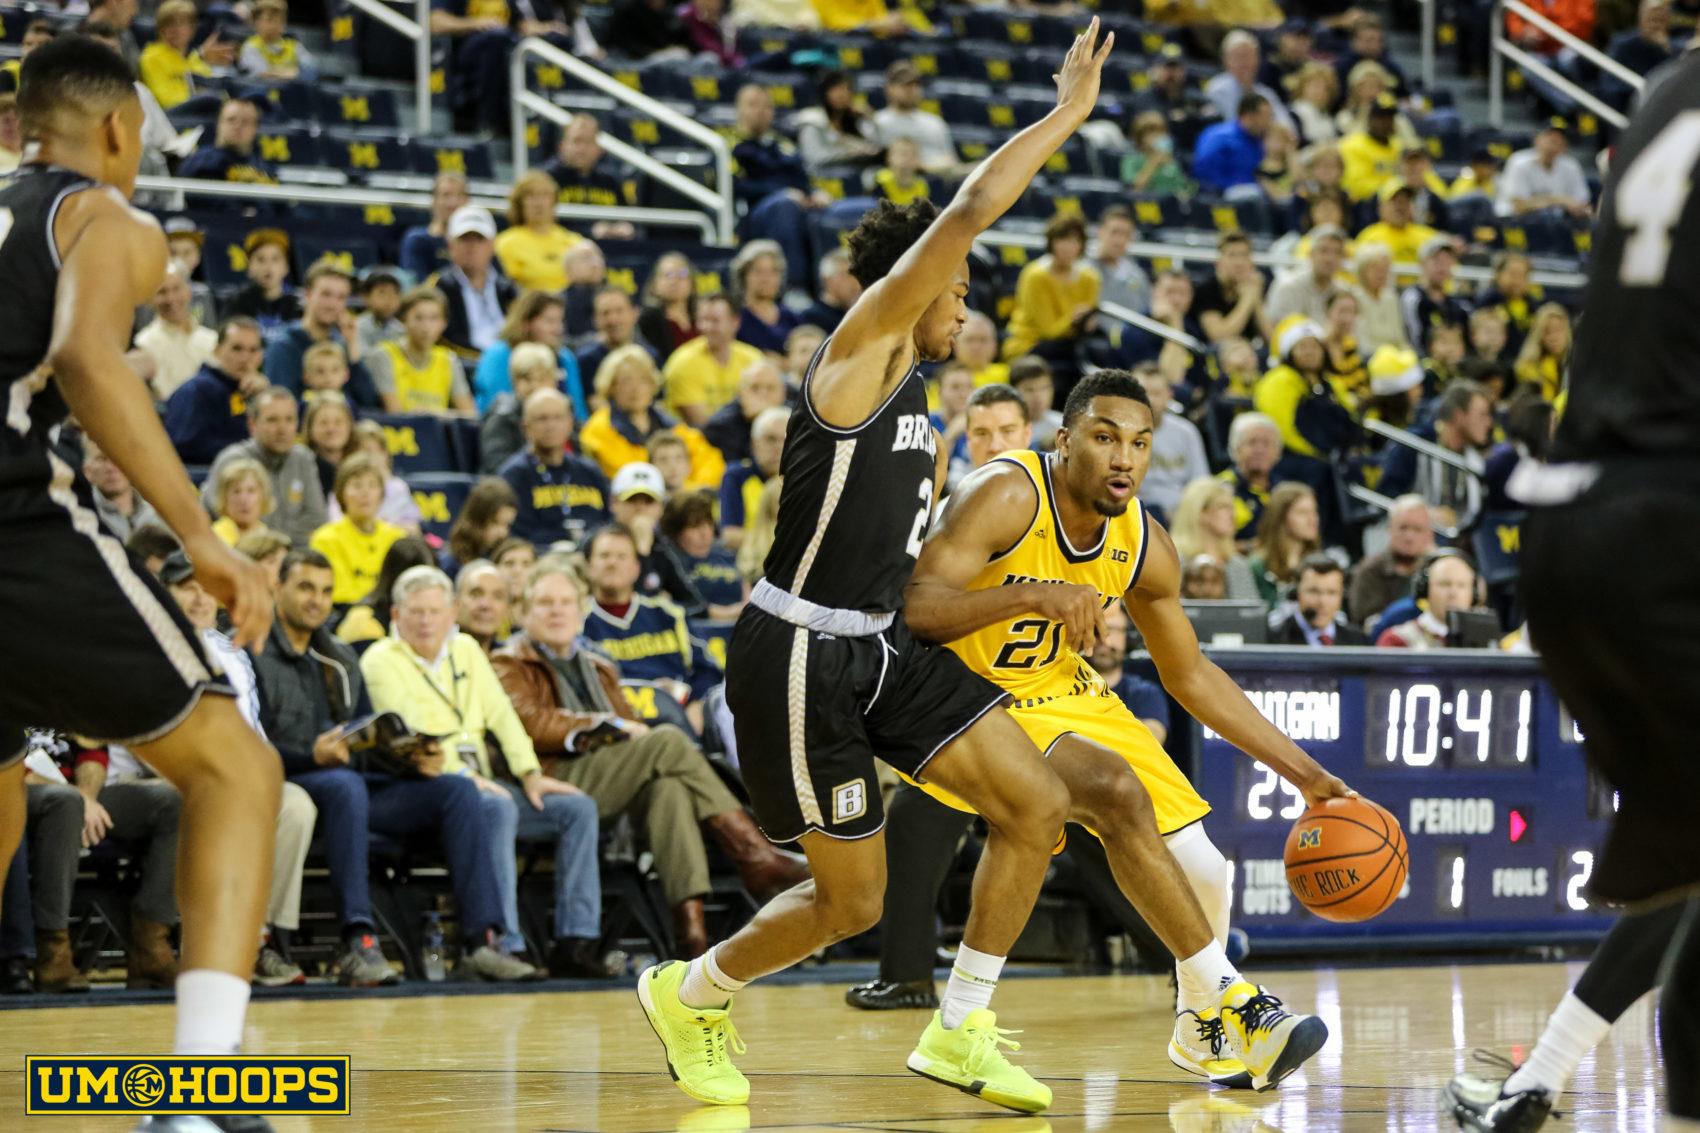 Michigan 96, Bryant 60-10